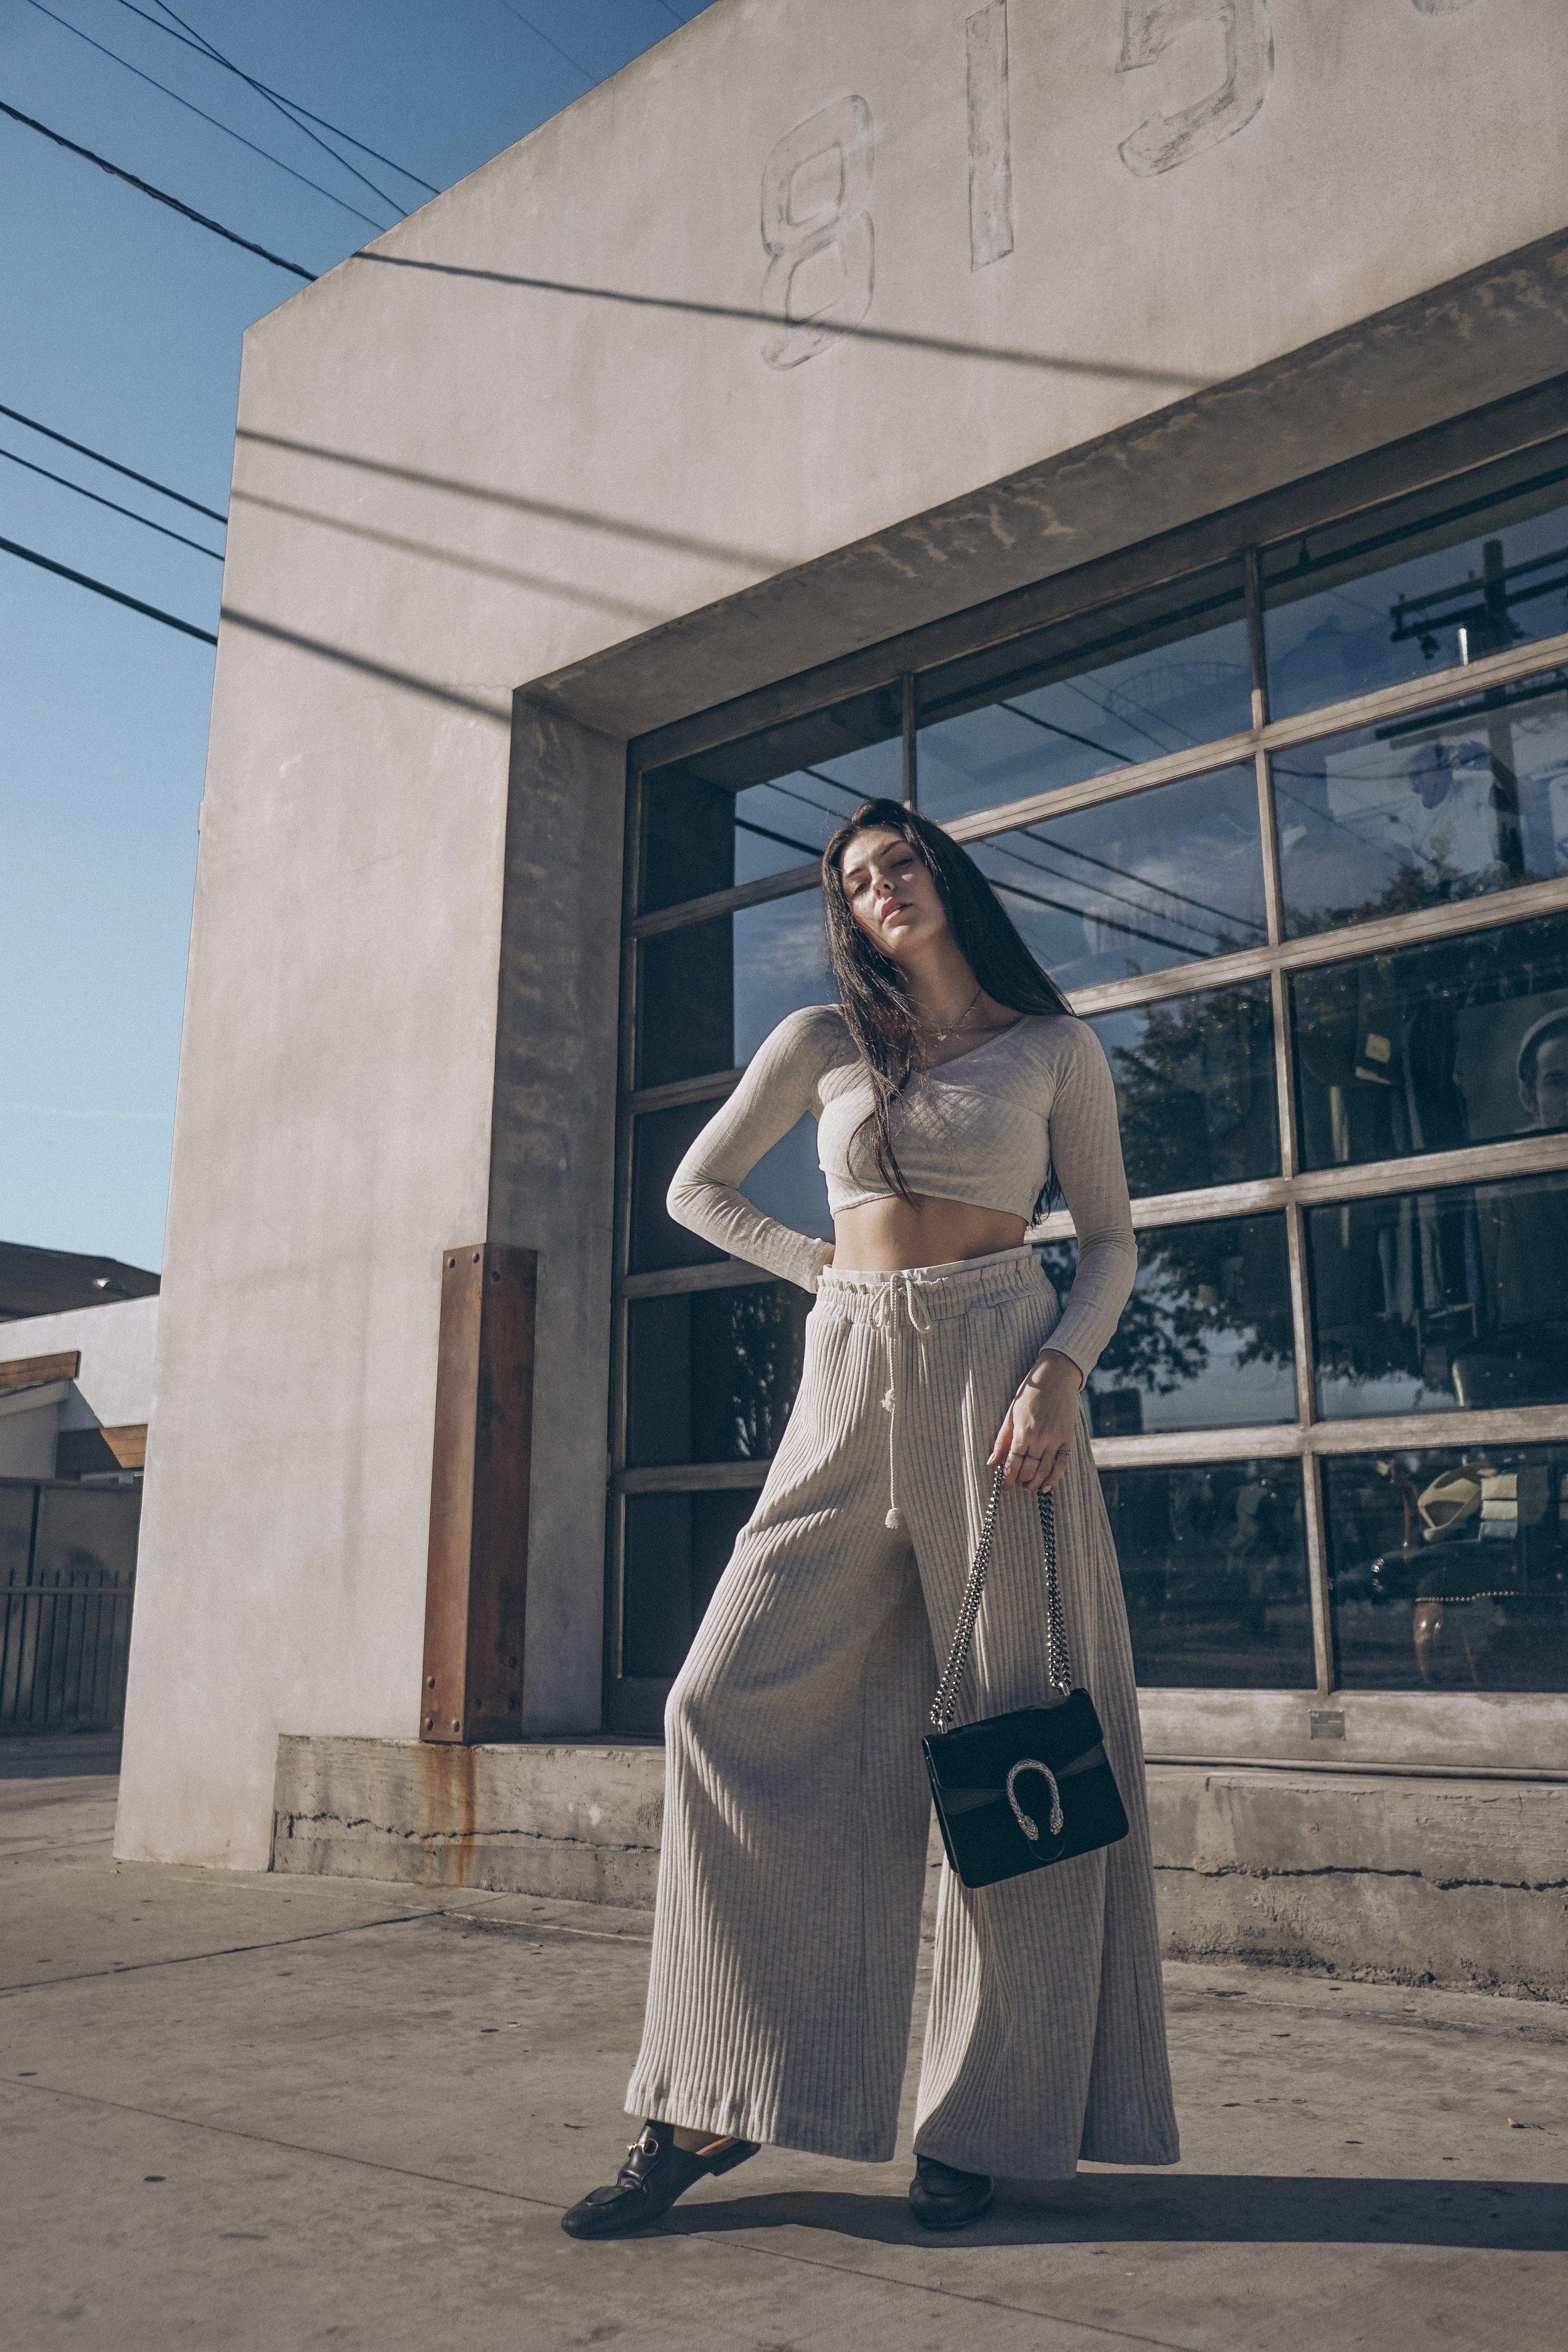 20 Sweatpants You'll Love for Under $100 - Julia Friedman wearing Free People